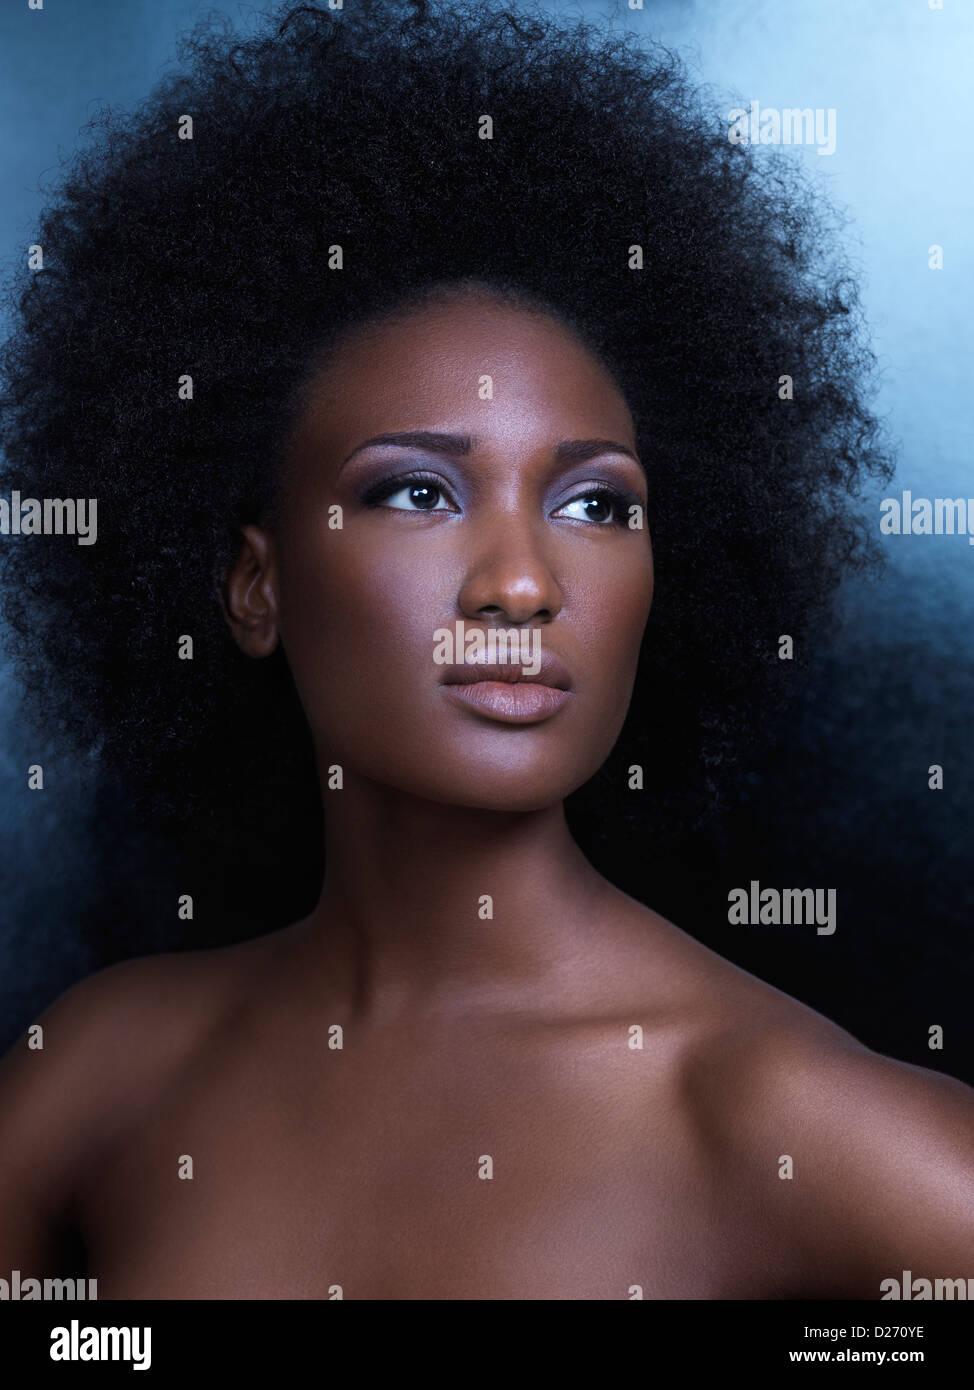 Belleza retrato de una joven afroamericana con grandes cabello natural Imagen De Stock